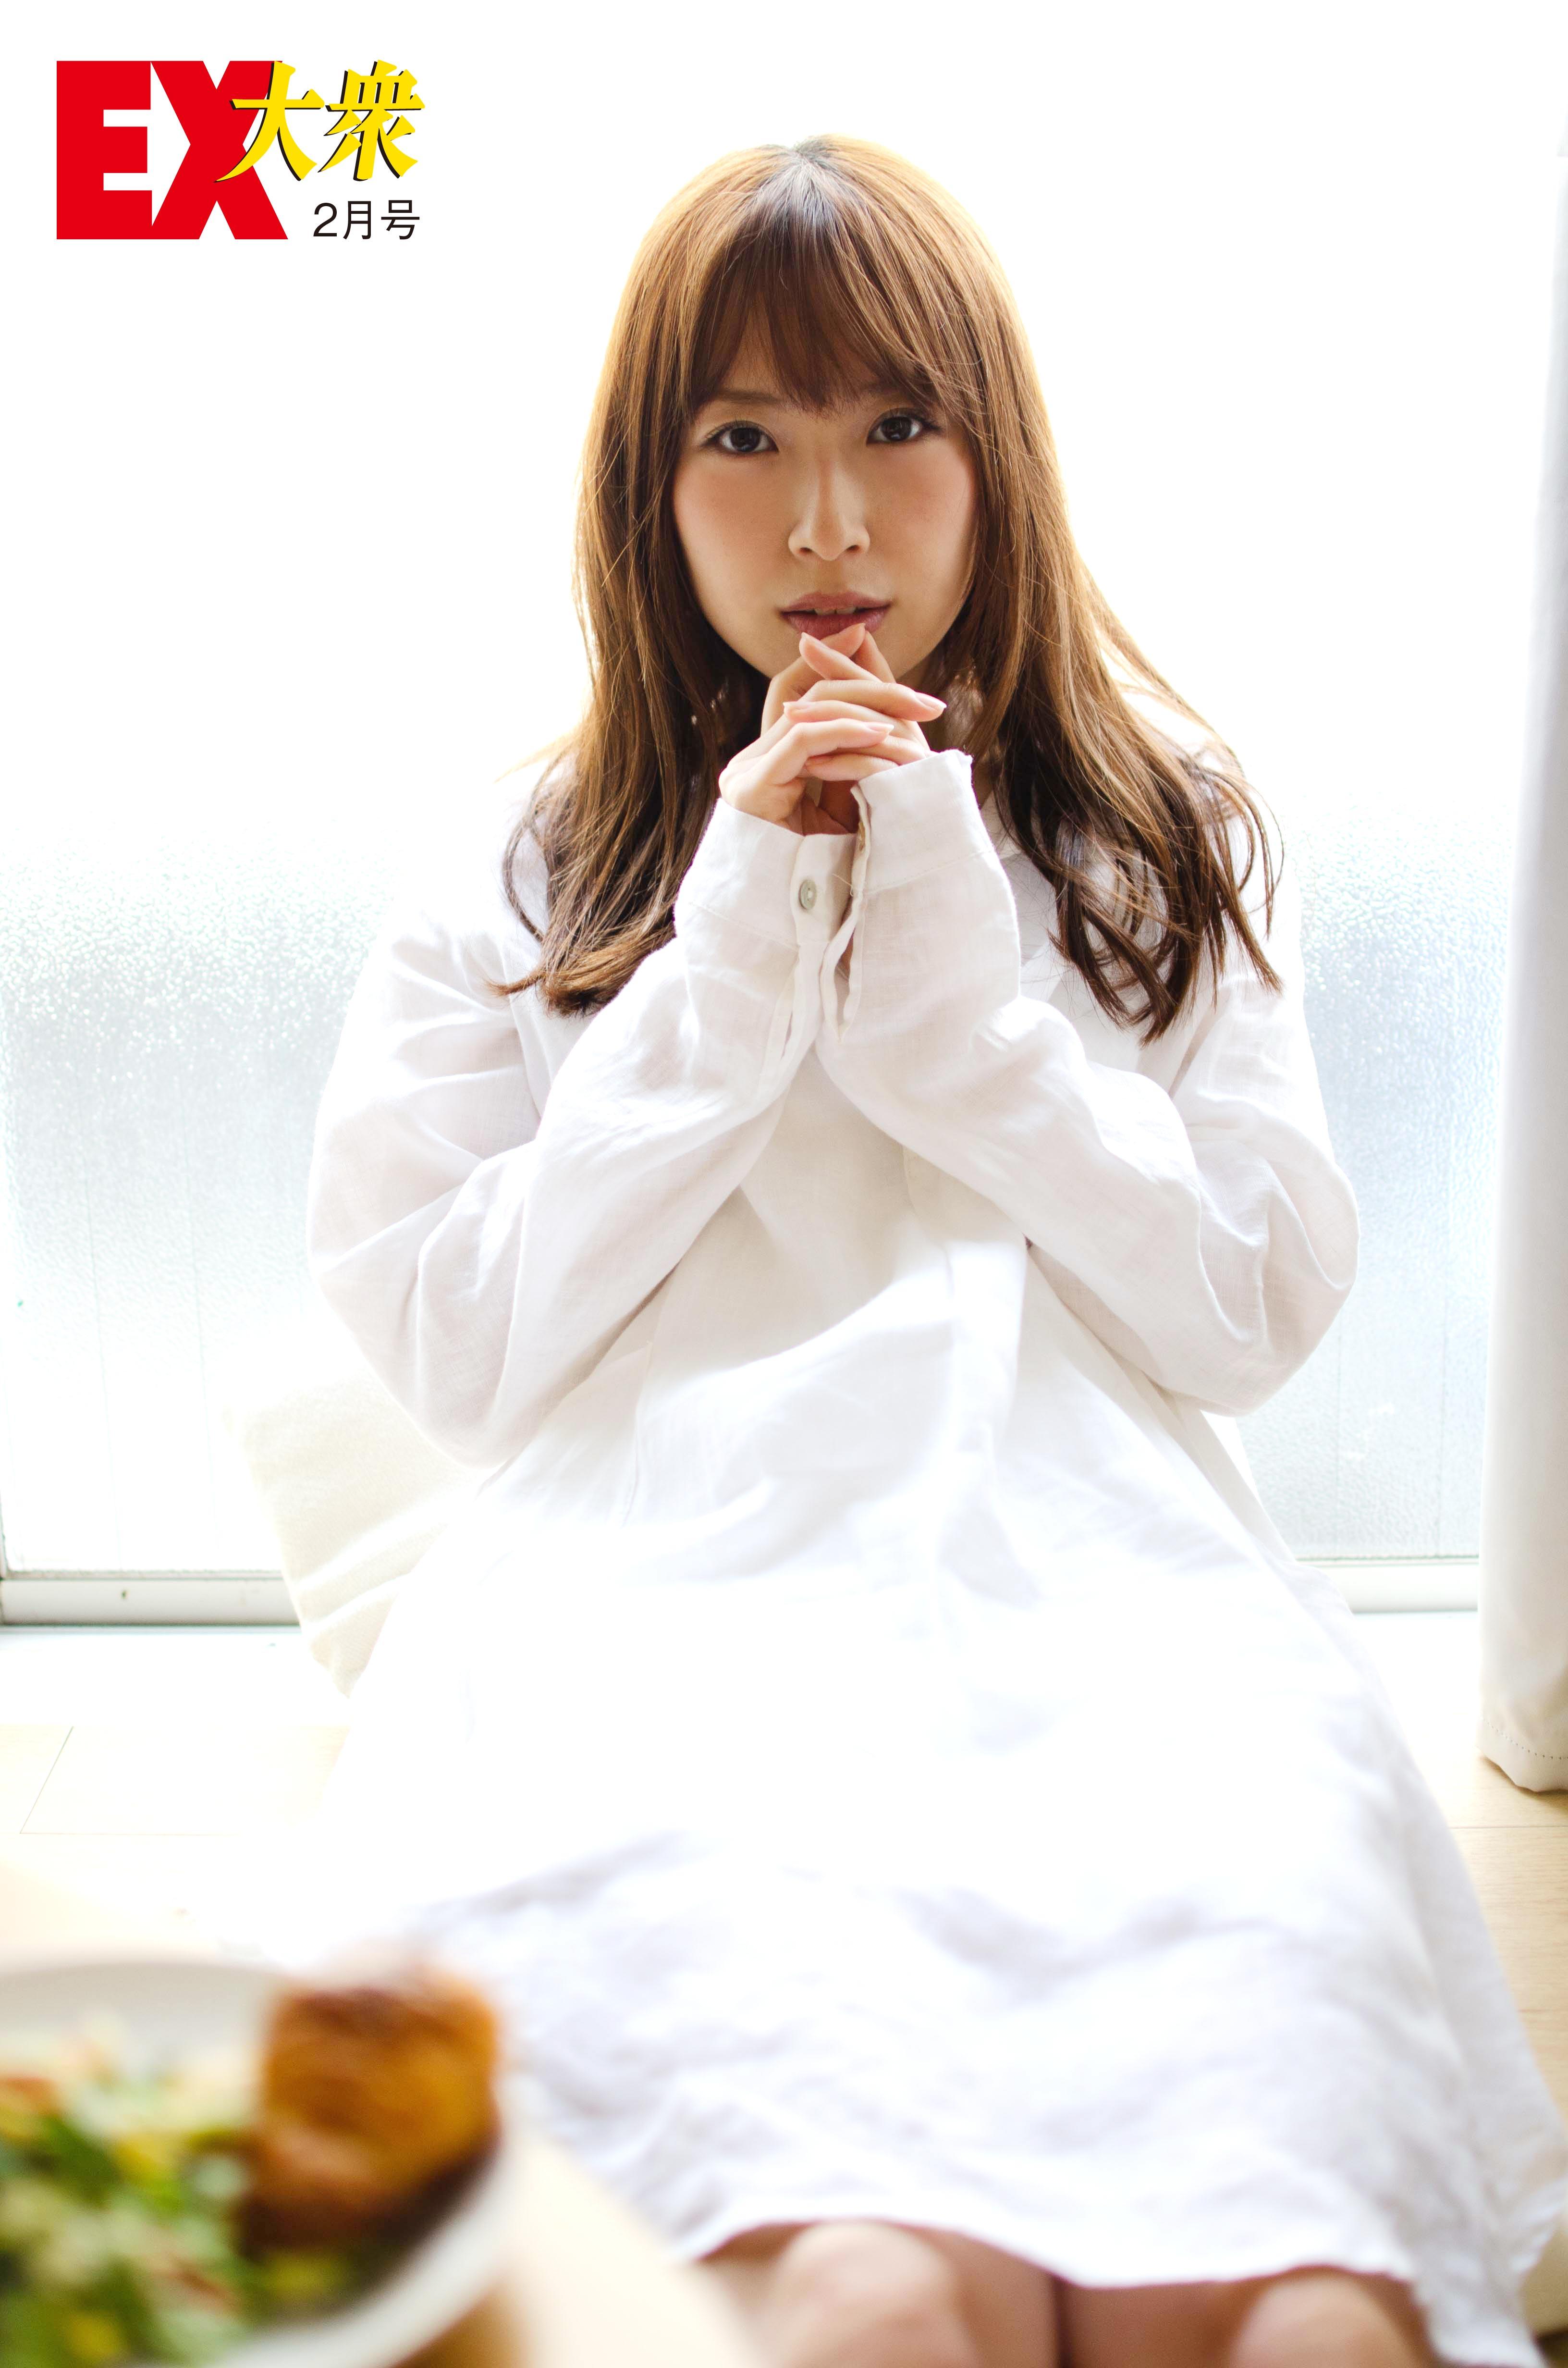 SKE48高柳明音の本誌未掲載カット5枚を大公開!【EX大衆2月号】の画像003